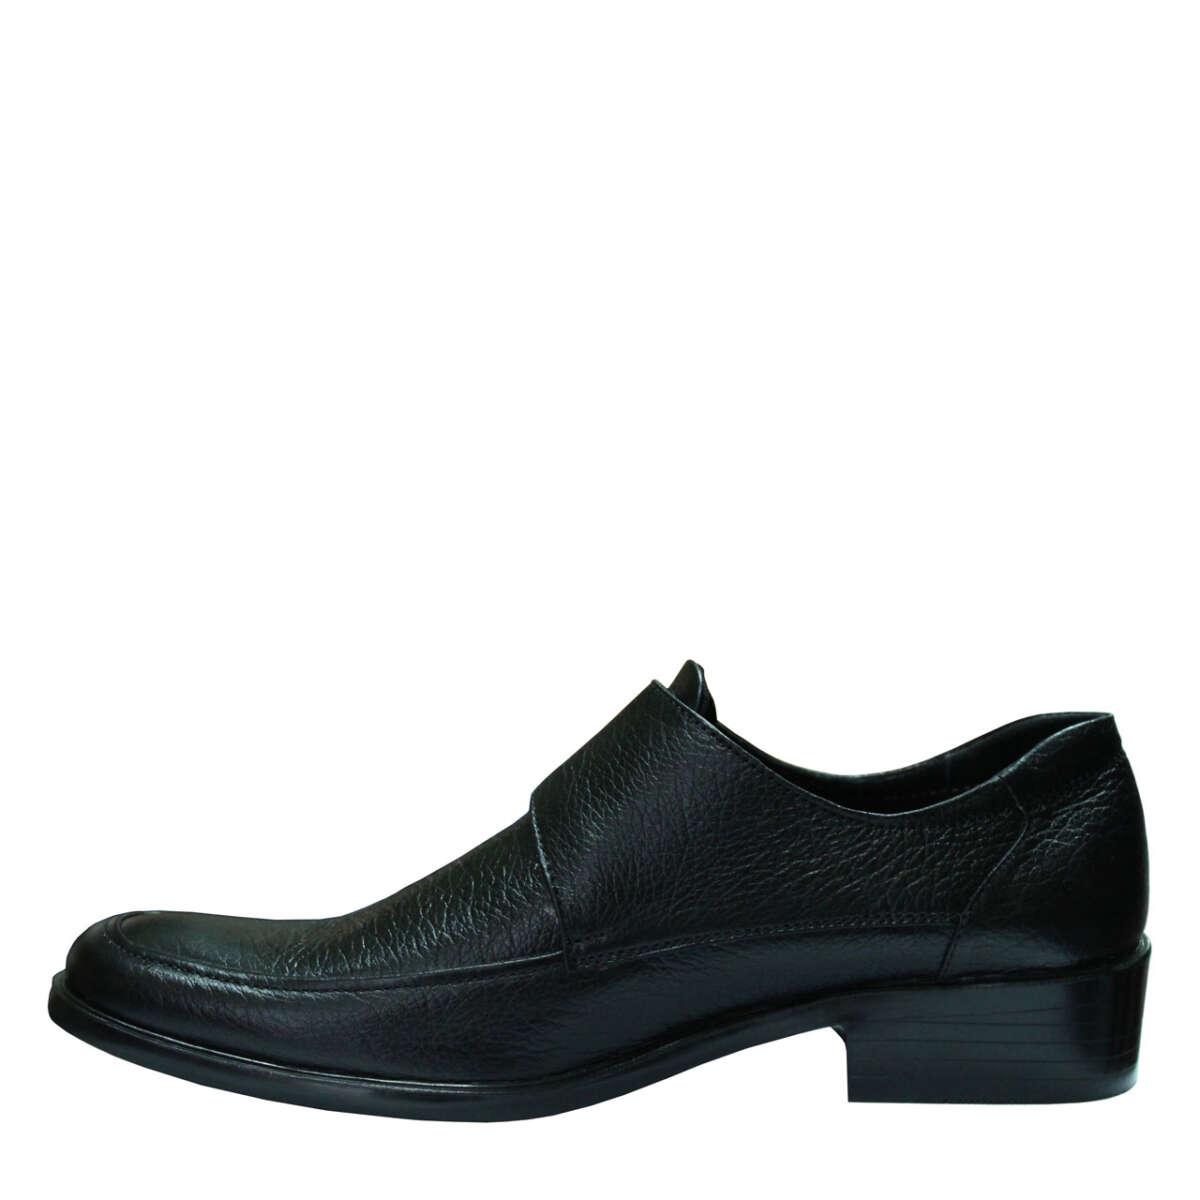 Giày nam da bò B853a